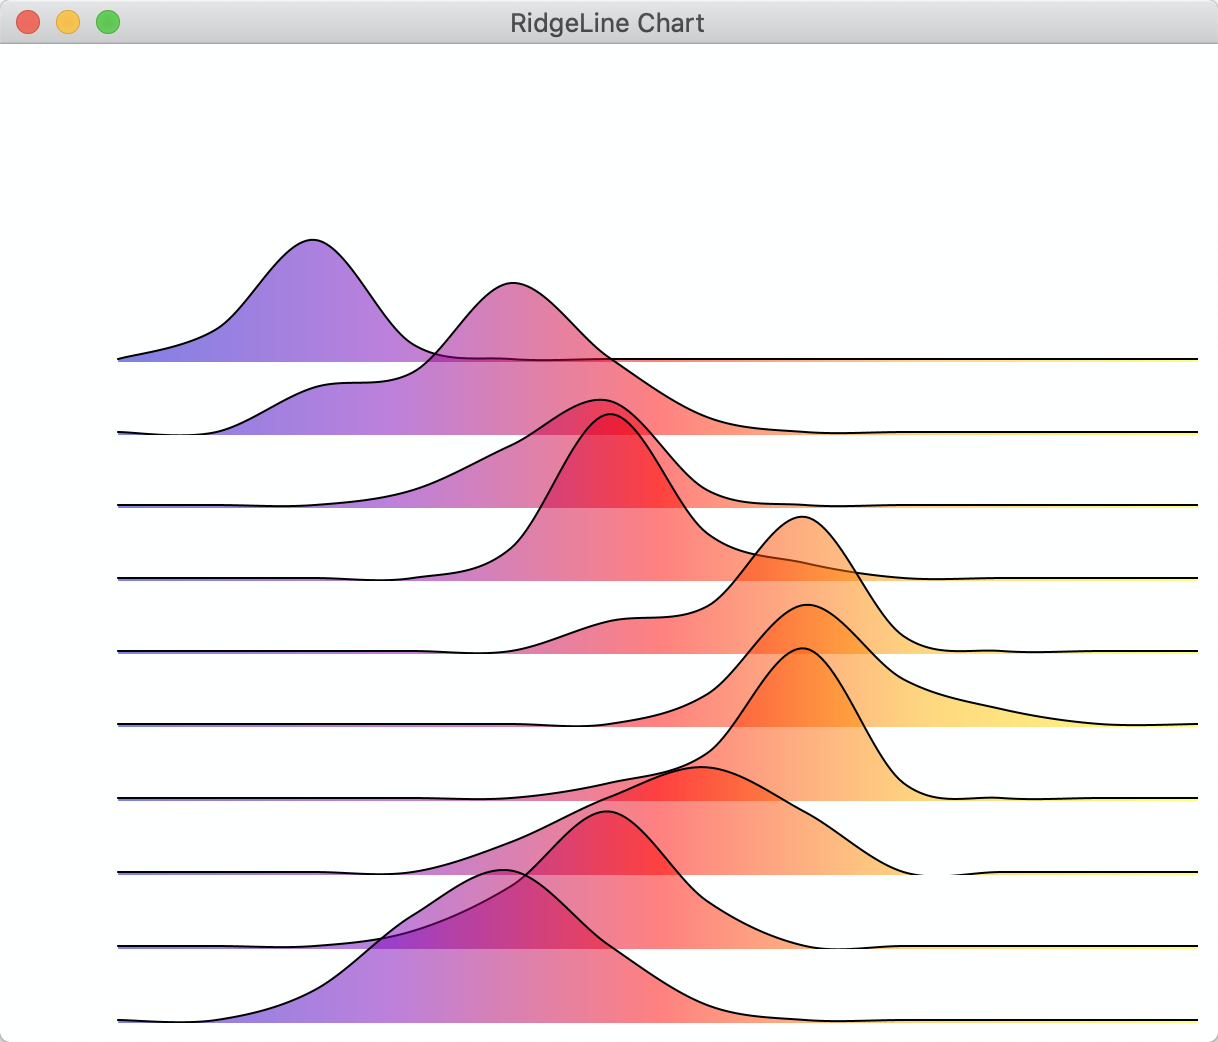 Ridge line chart